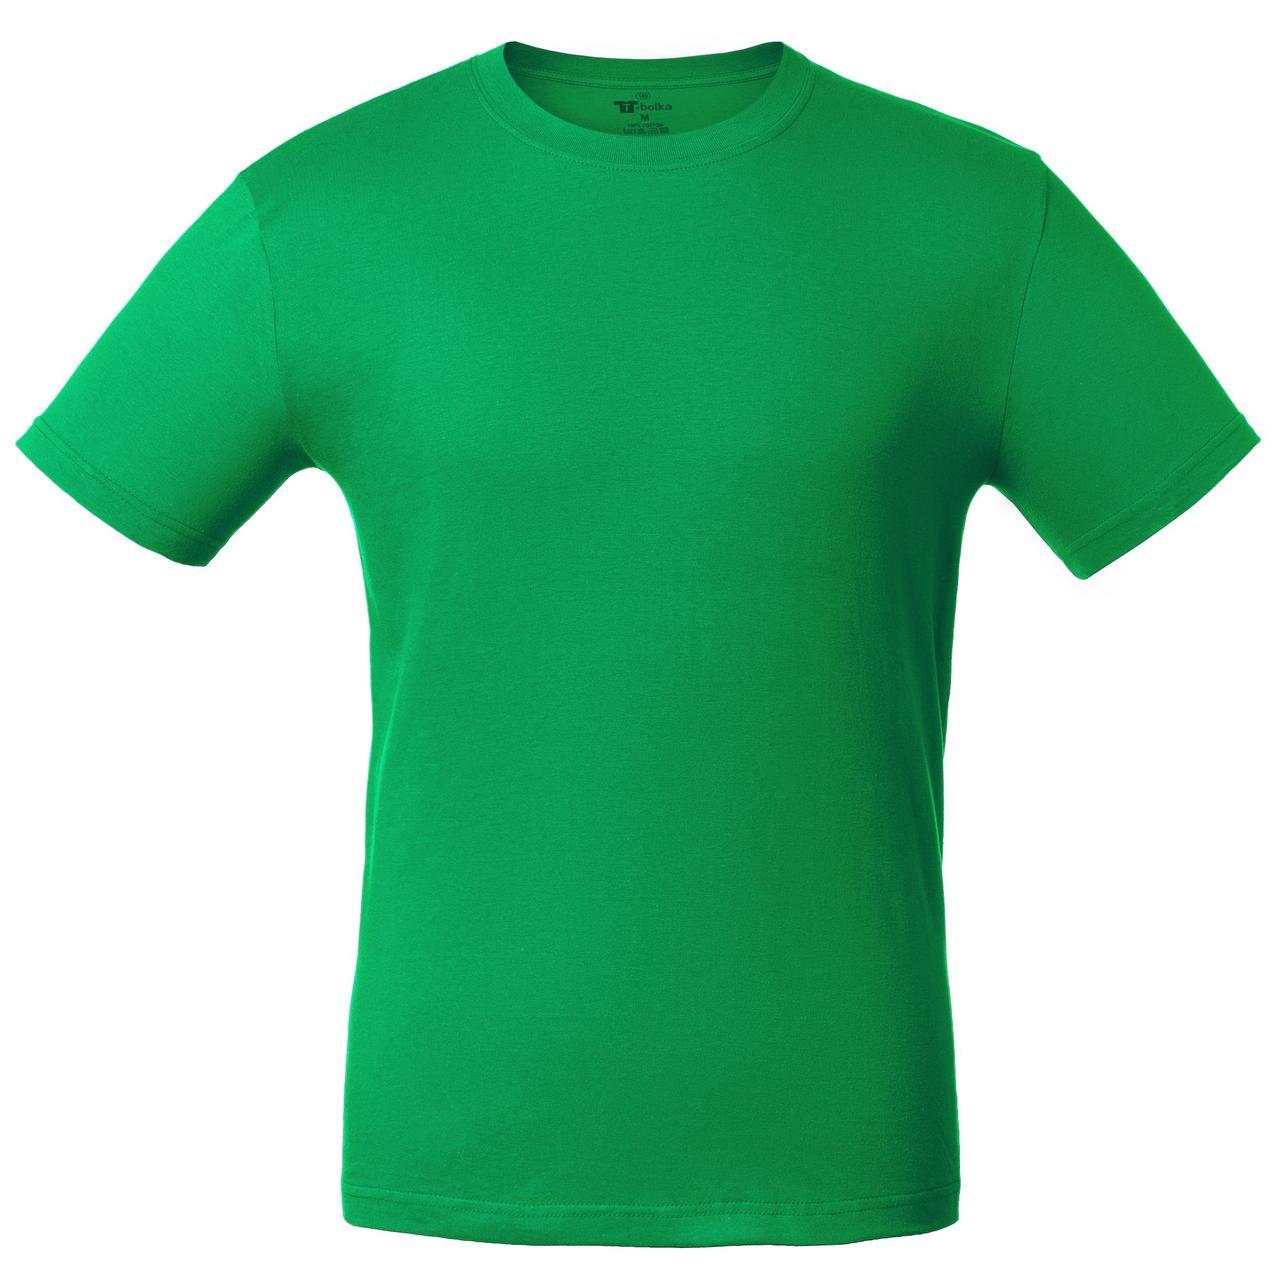 Футболки зеленого цвета под нанесение логотипа